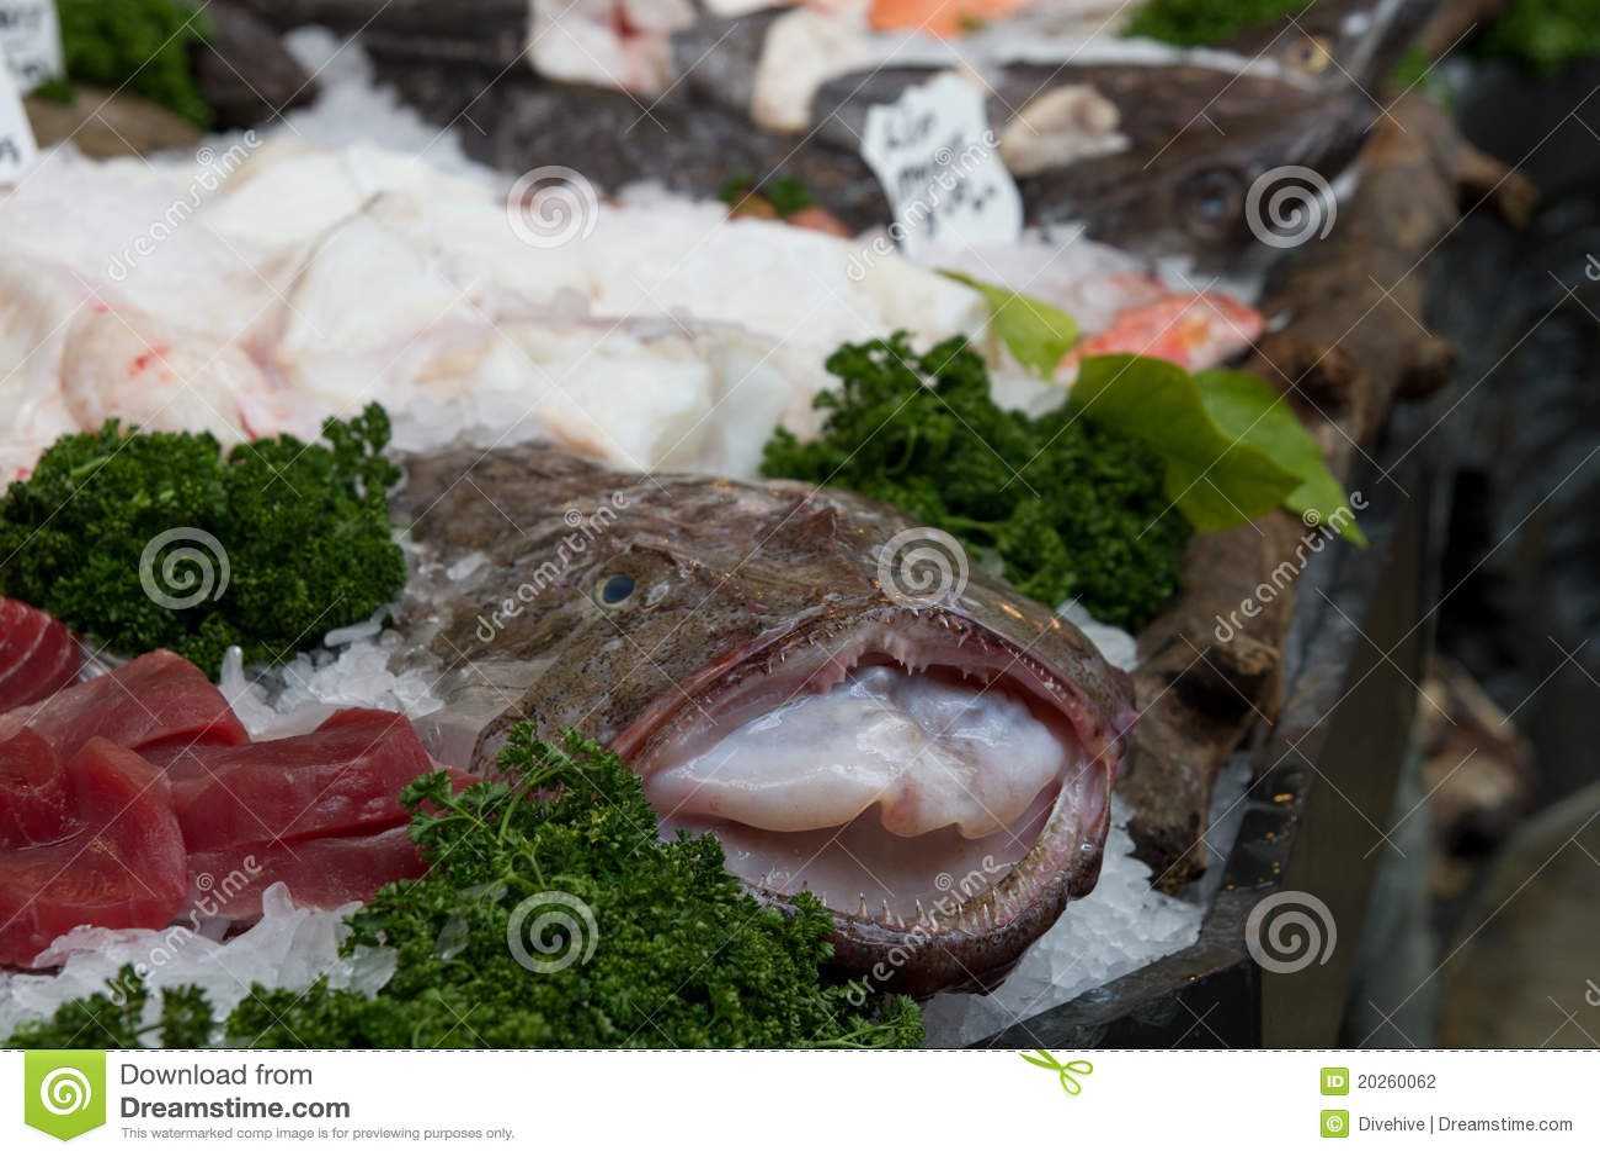 Monkfish at fishmarket